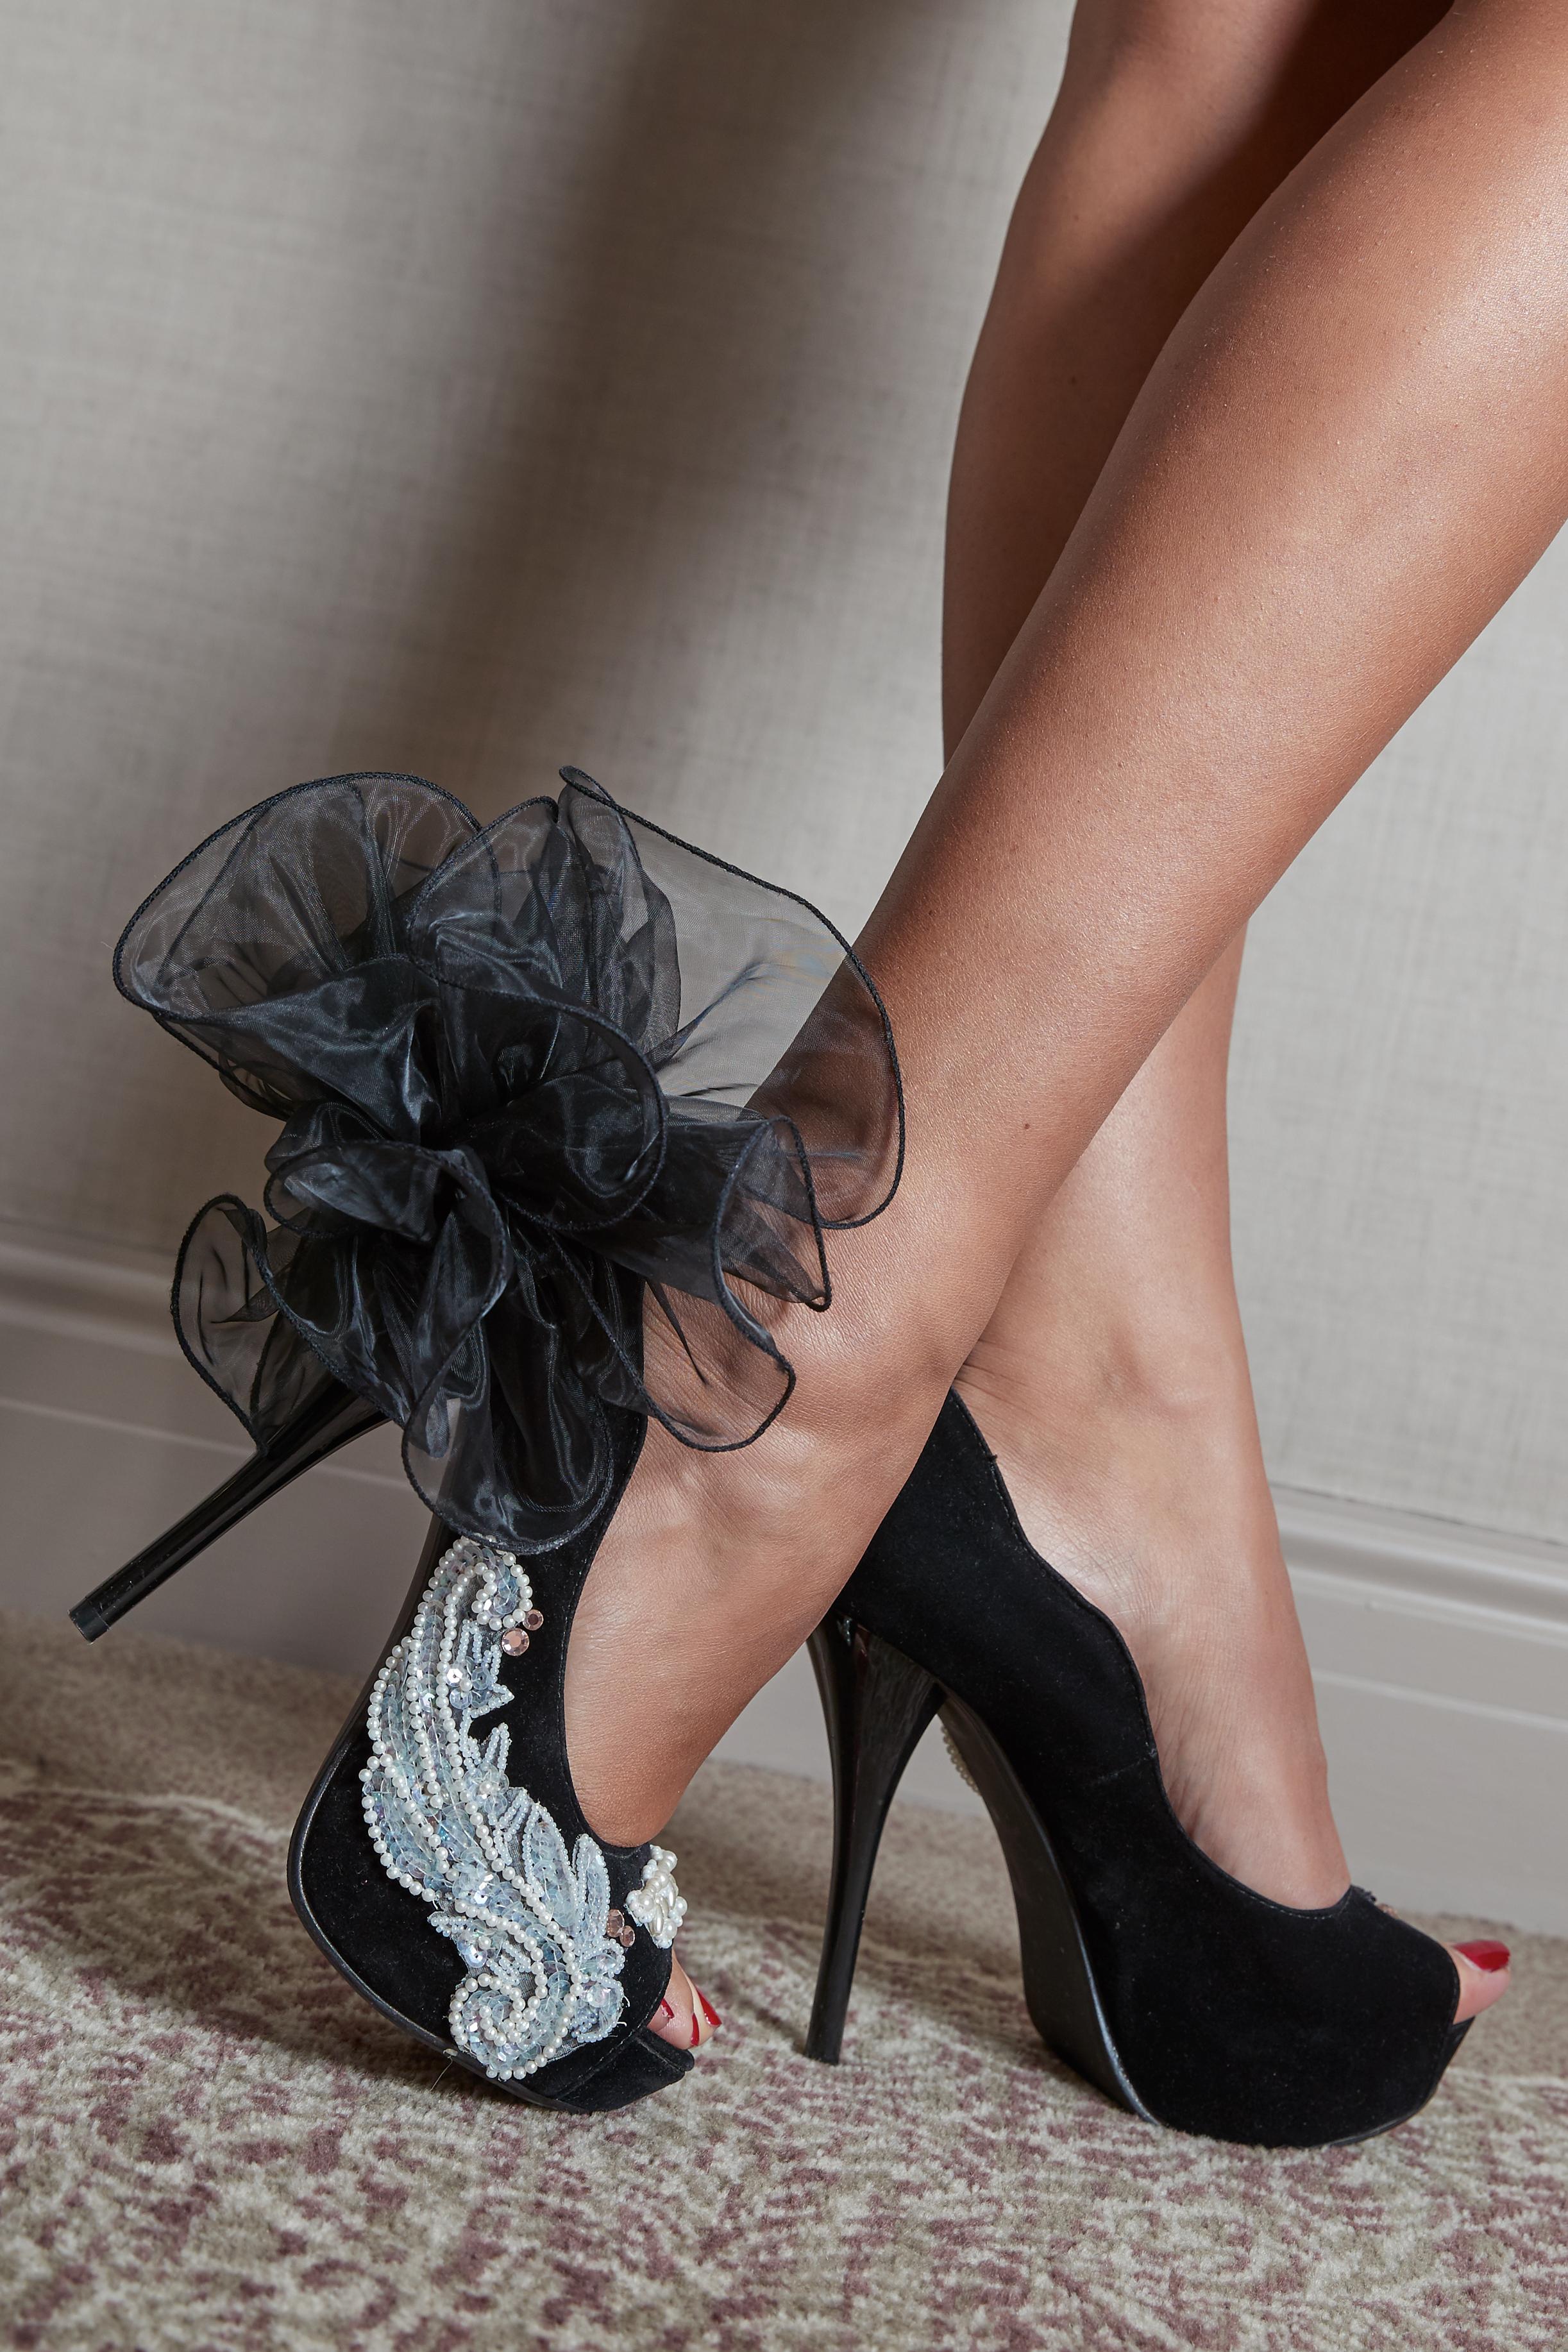 Kilame shoes design by Pamela Quinzi